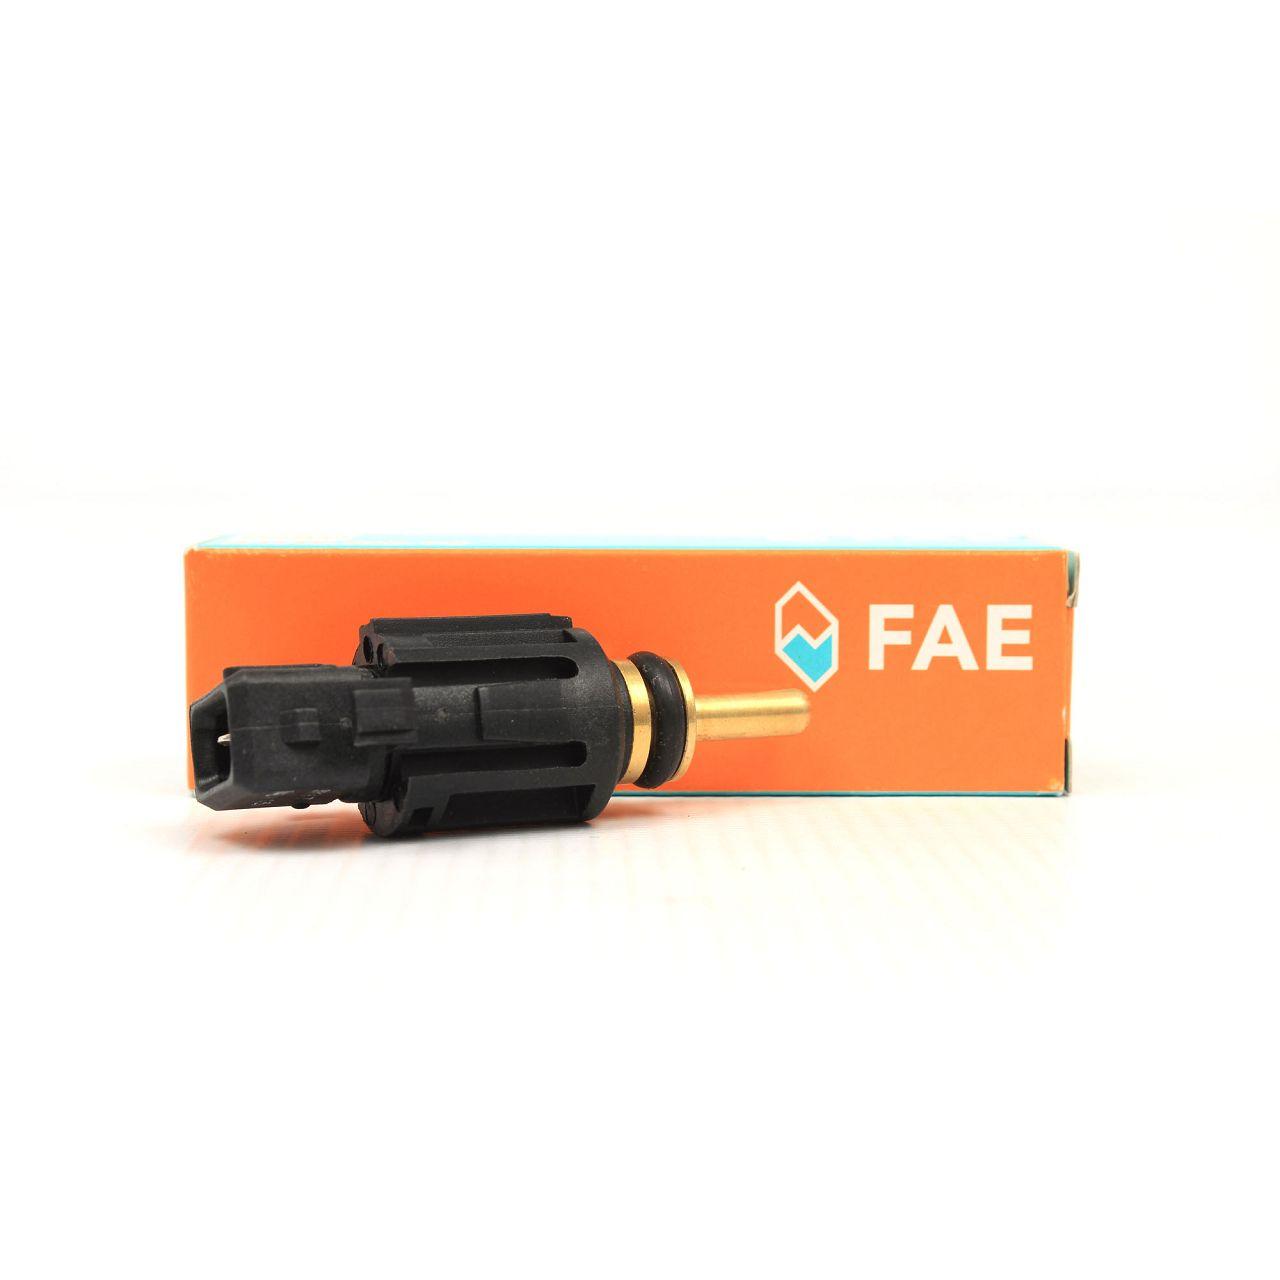 FAE Temperaturgeber Kühlmitteltemperaturgeber Sensor 2-polig für BMW MINI